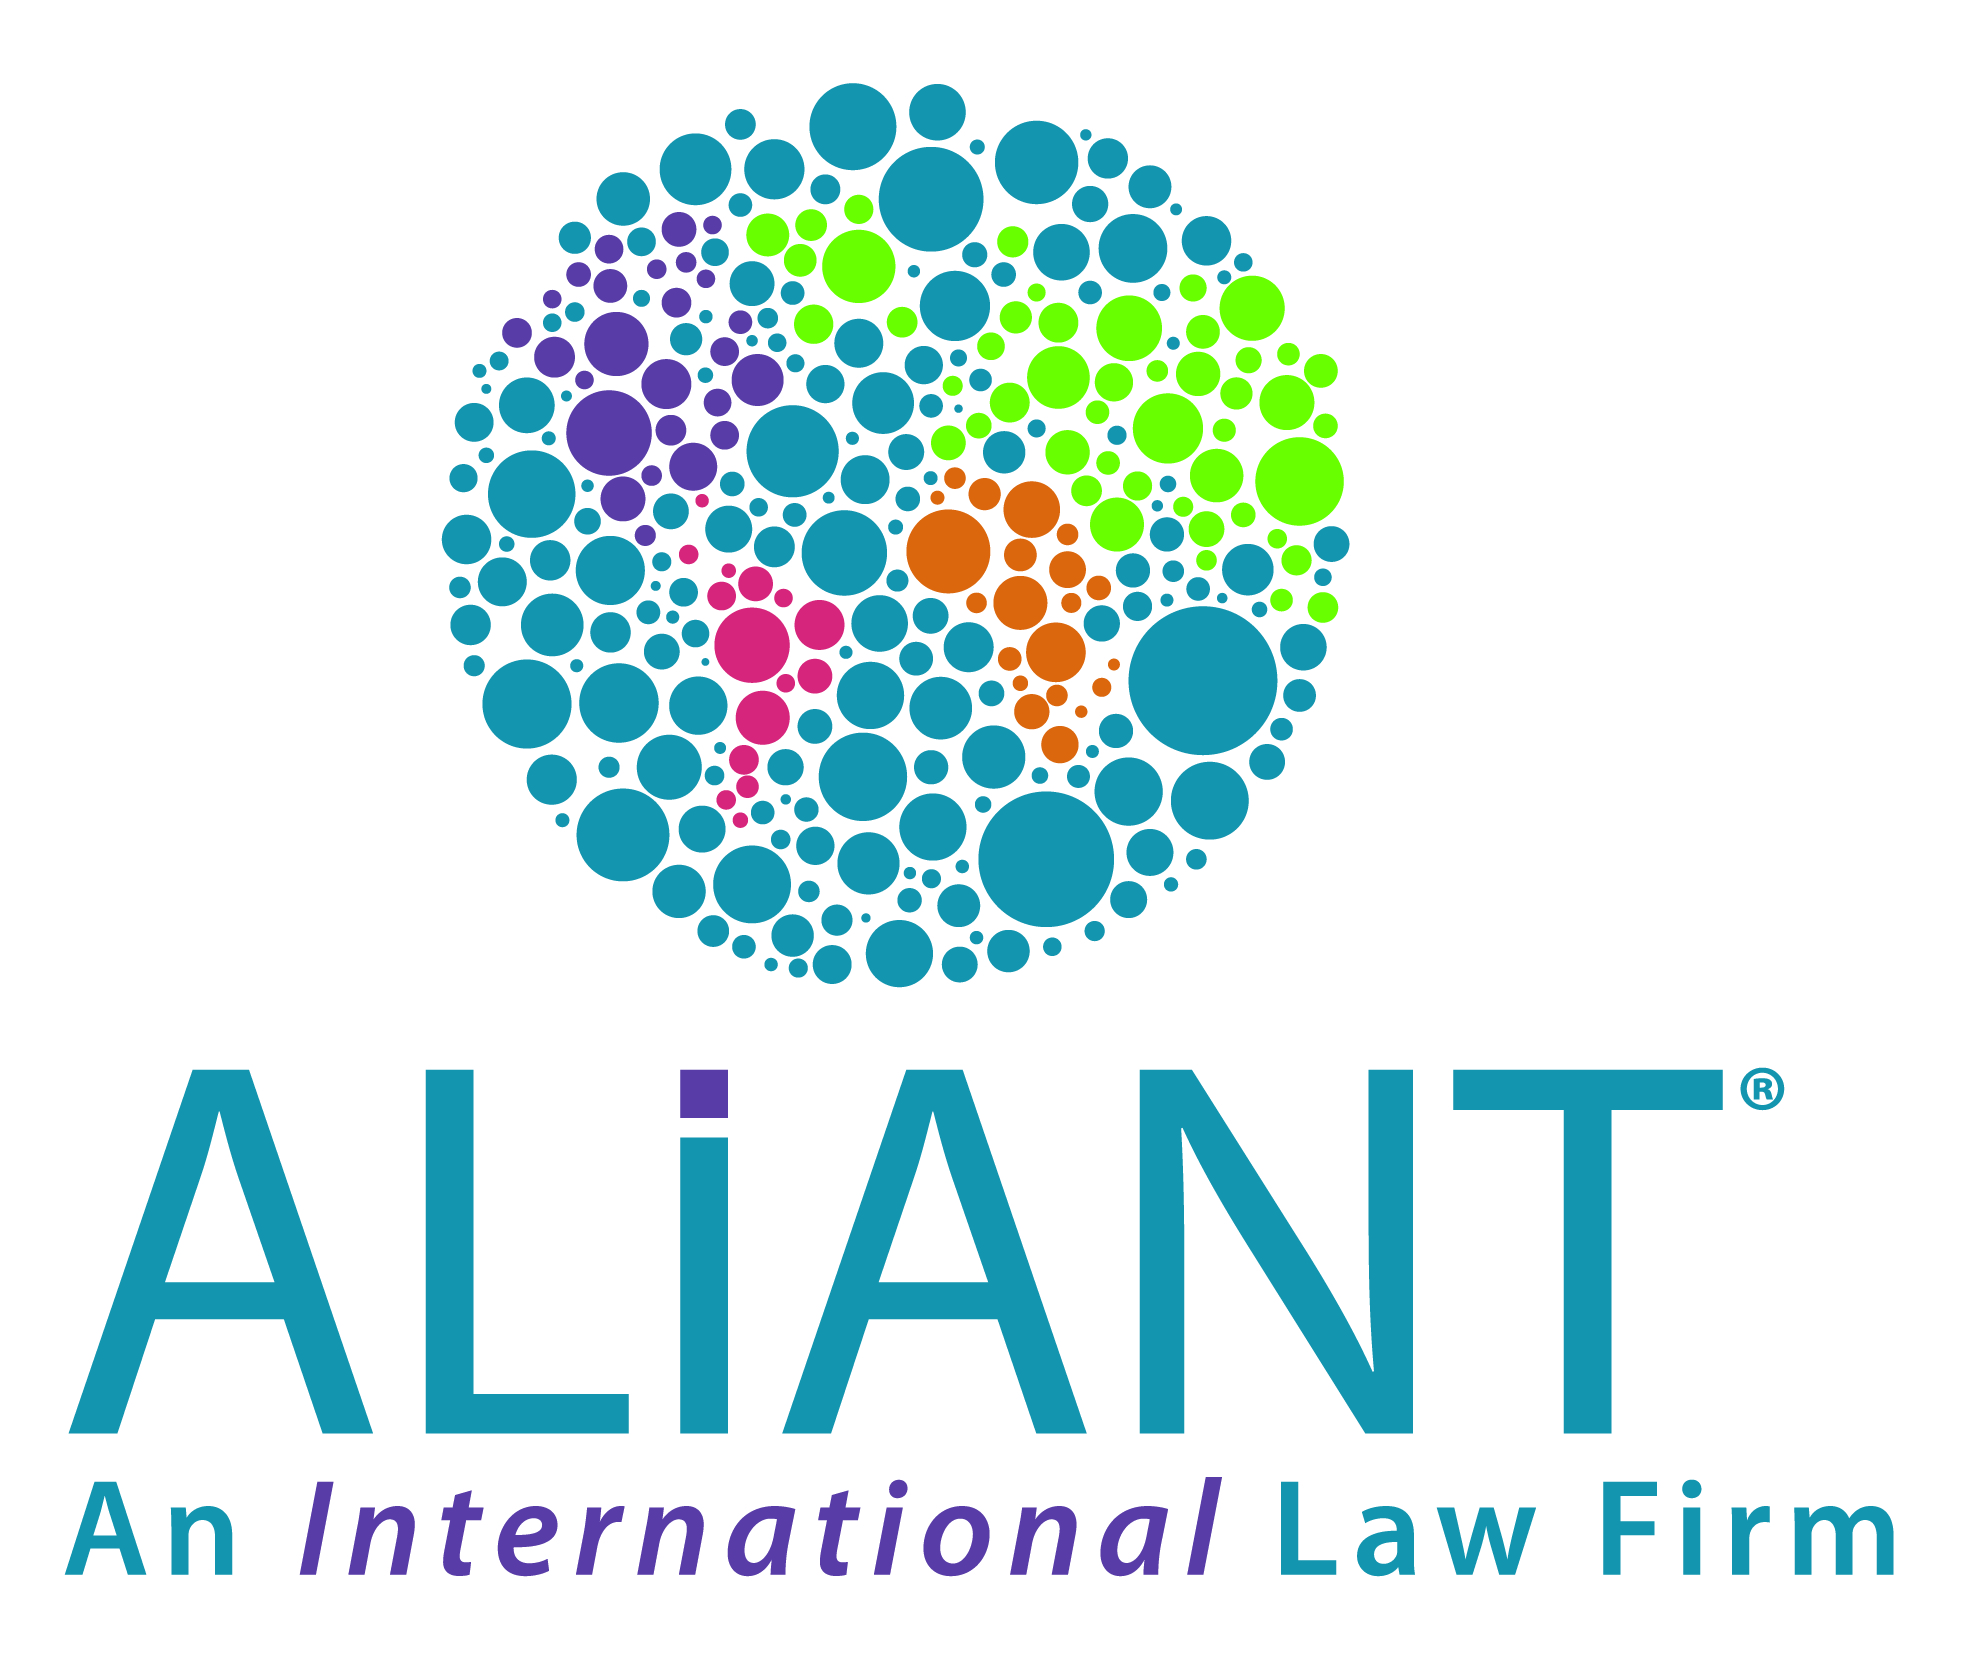 Aliant LLP